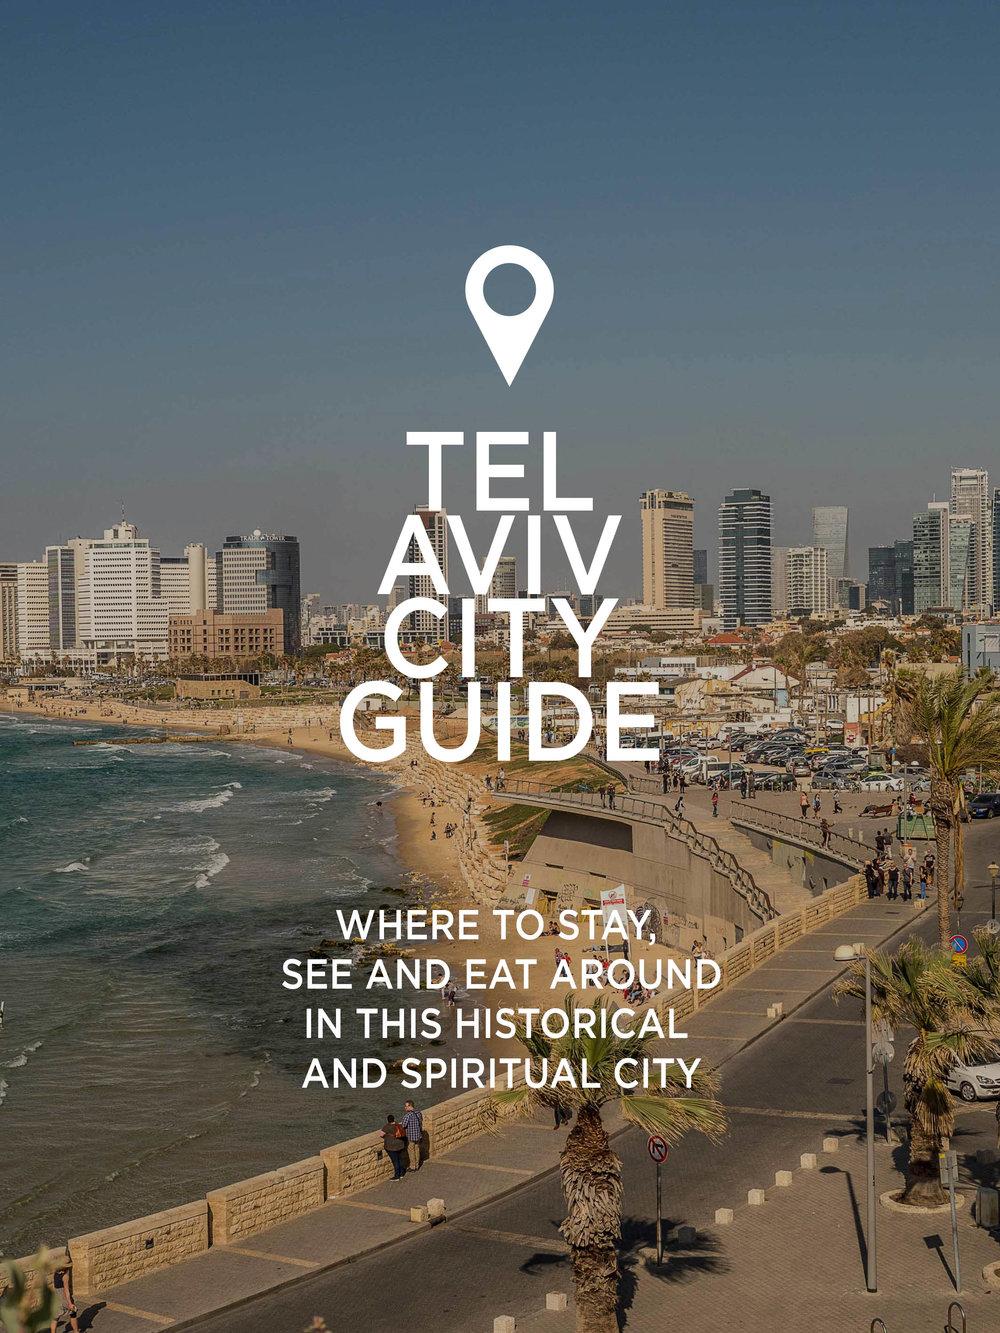 MYBELONGING-TEL-AVIV-CITY-GUIDE-TRAVEL-PHOTOGRAPHY.jpg